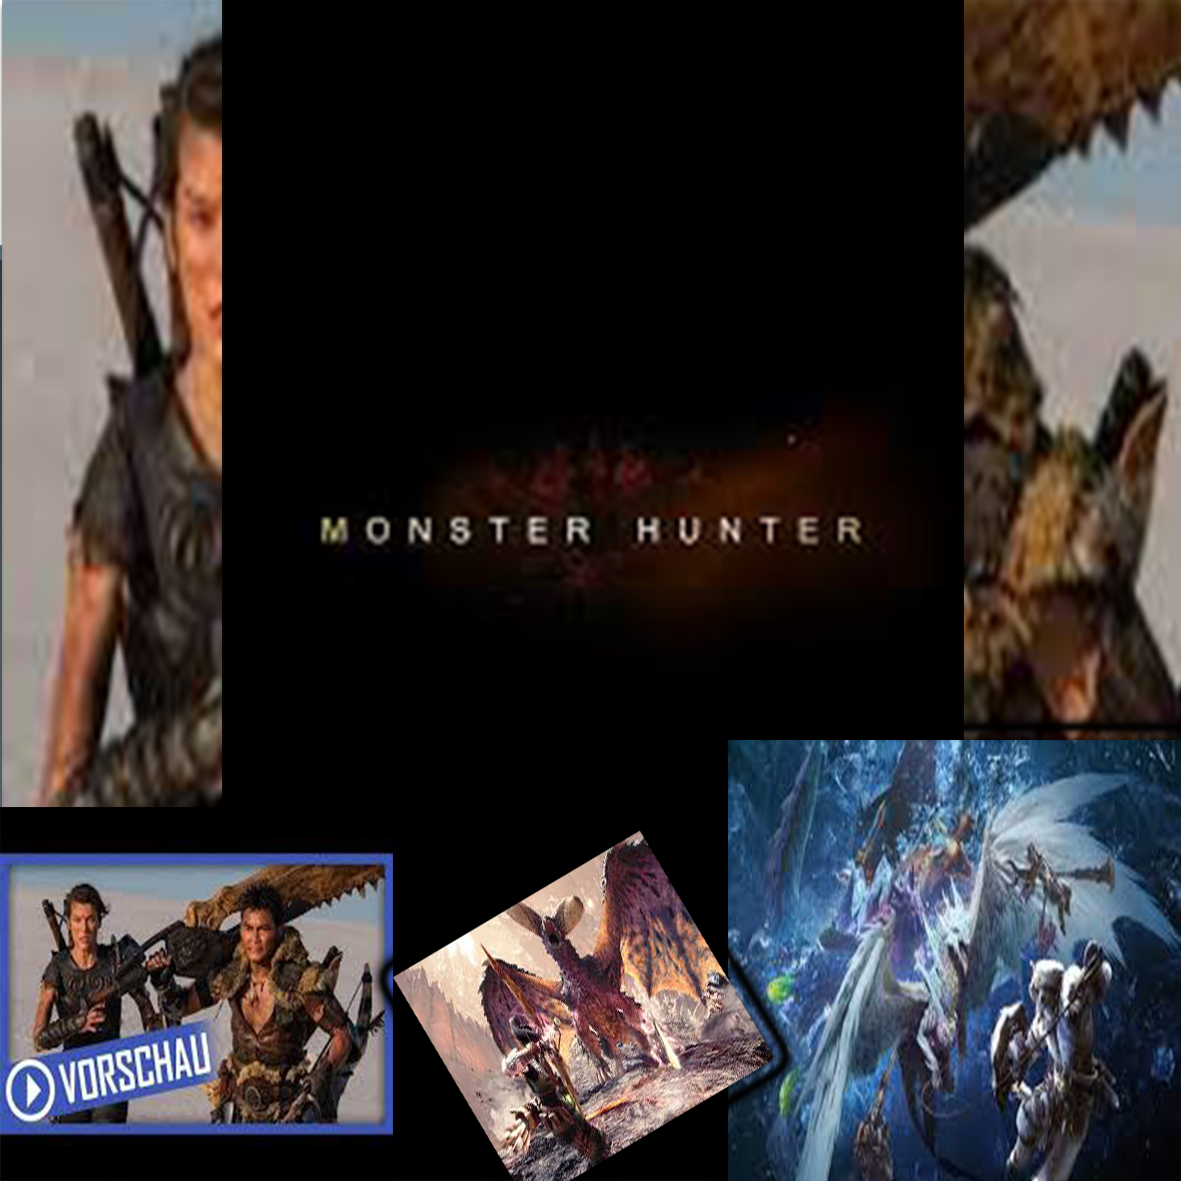 Monster Hunter 2020 In 2020 Monster Hunter Monster Hunter